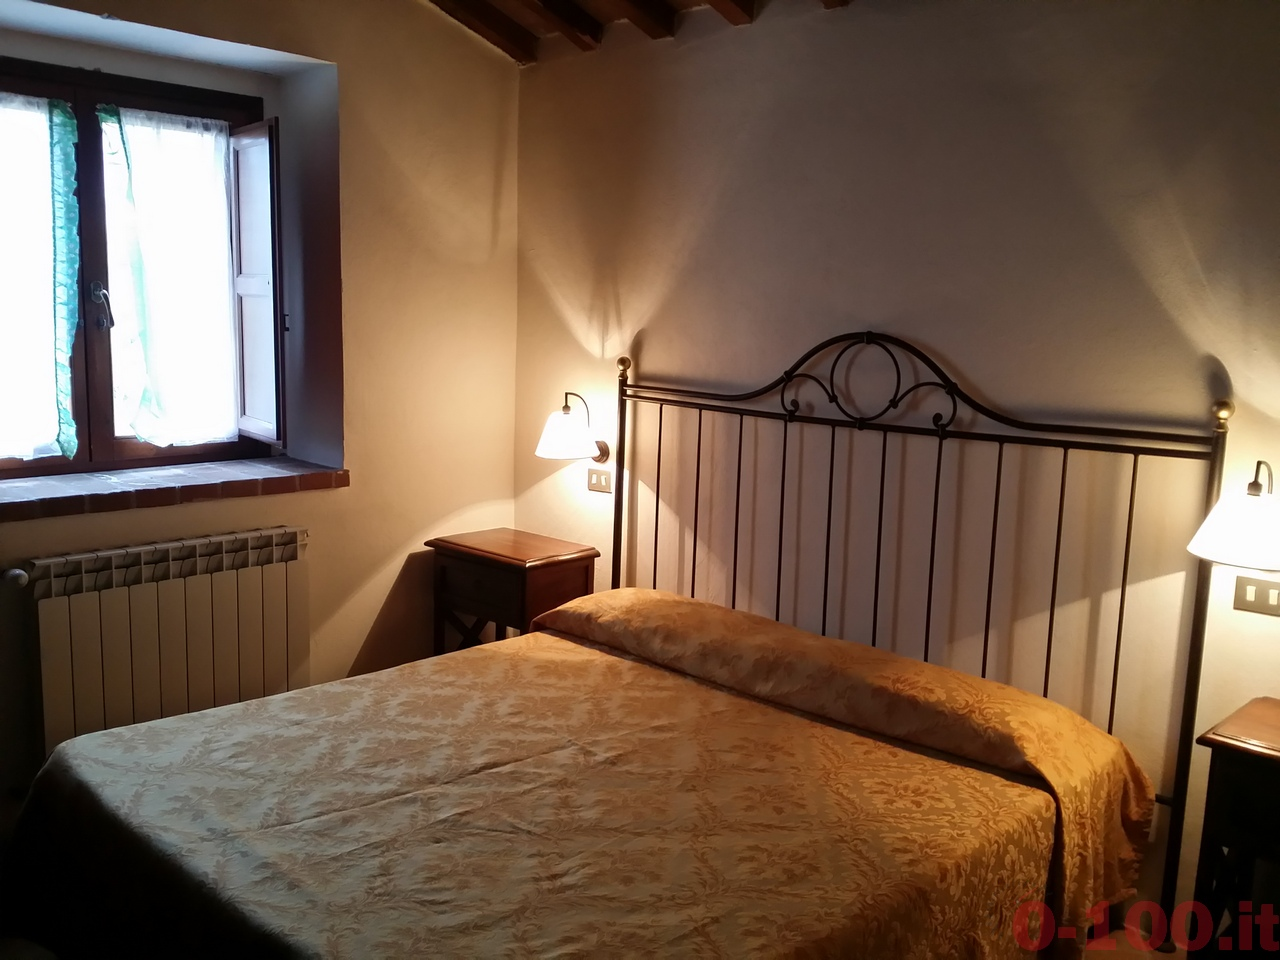 santa-felicita-paterna-turismo-umbria-agriturismo-vacanza-country-house-0-100_0-1004